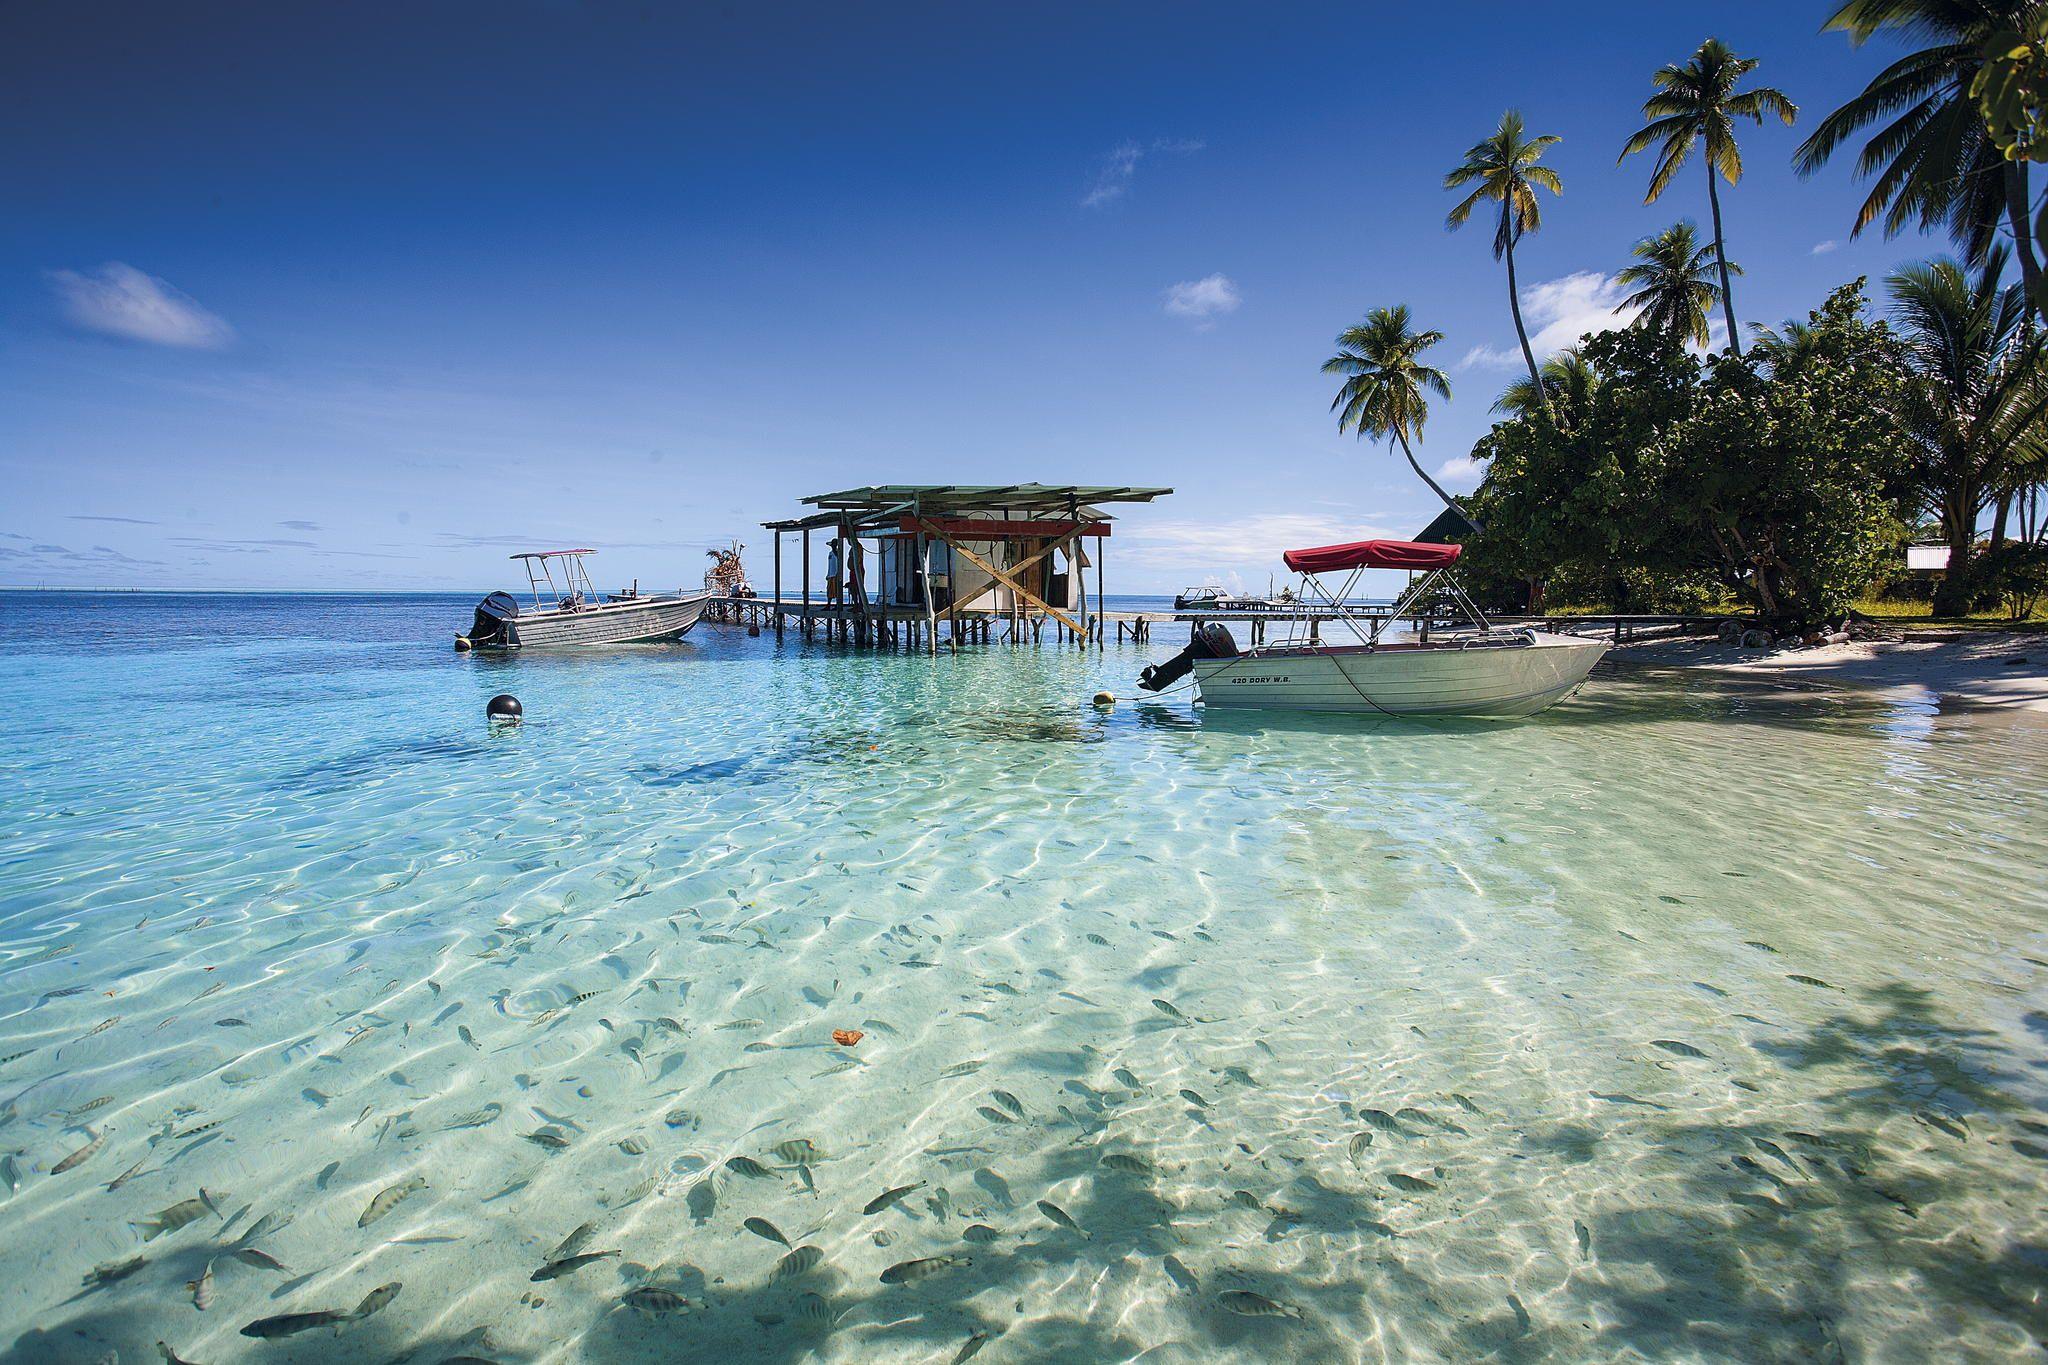 Tahiti by Roger Sharp on 500px